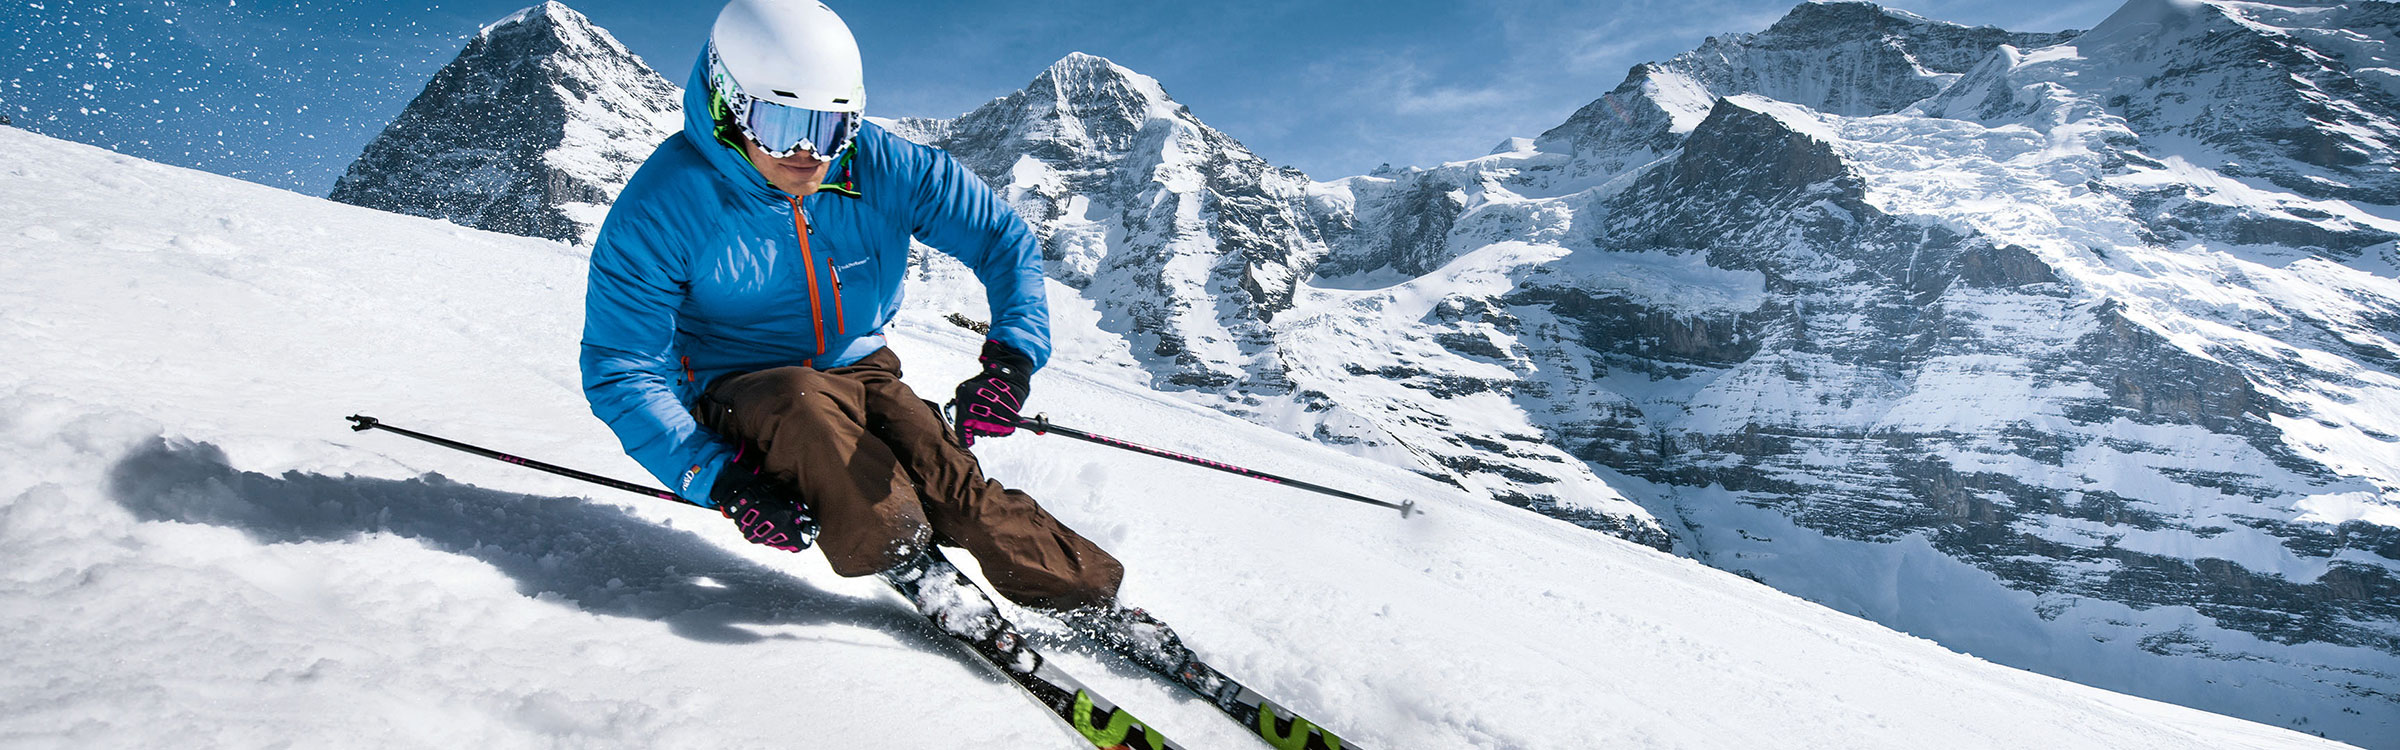 Ski algemeen